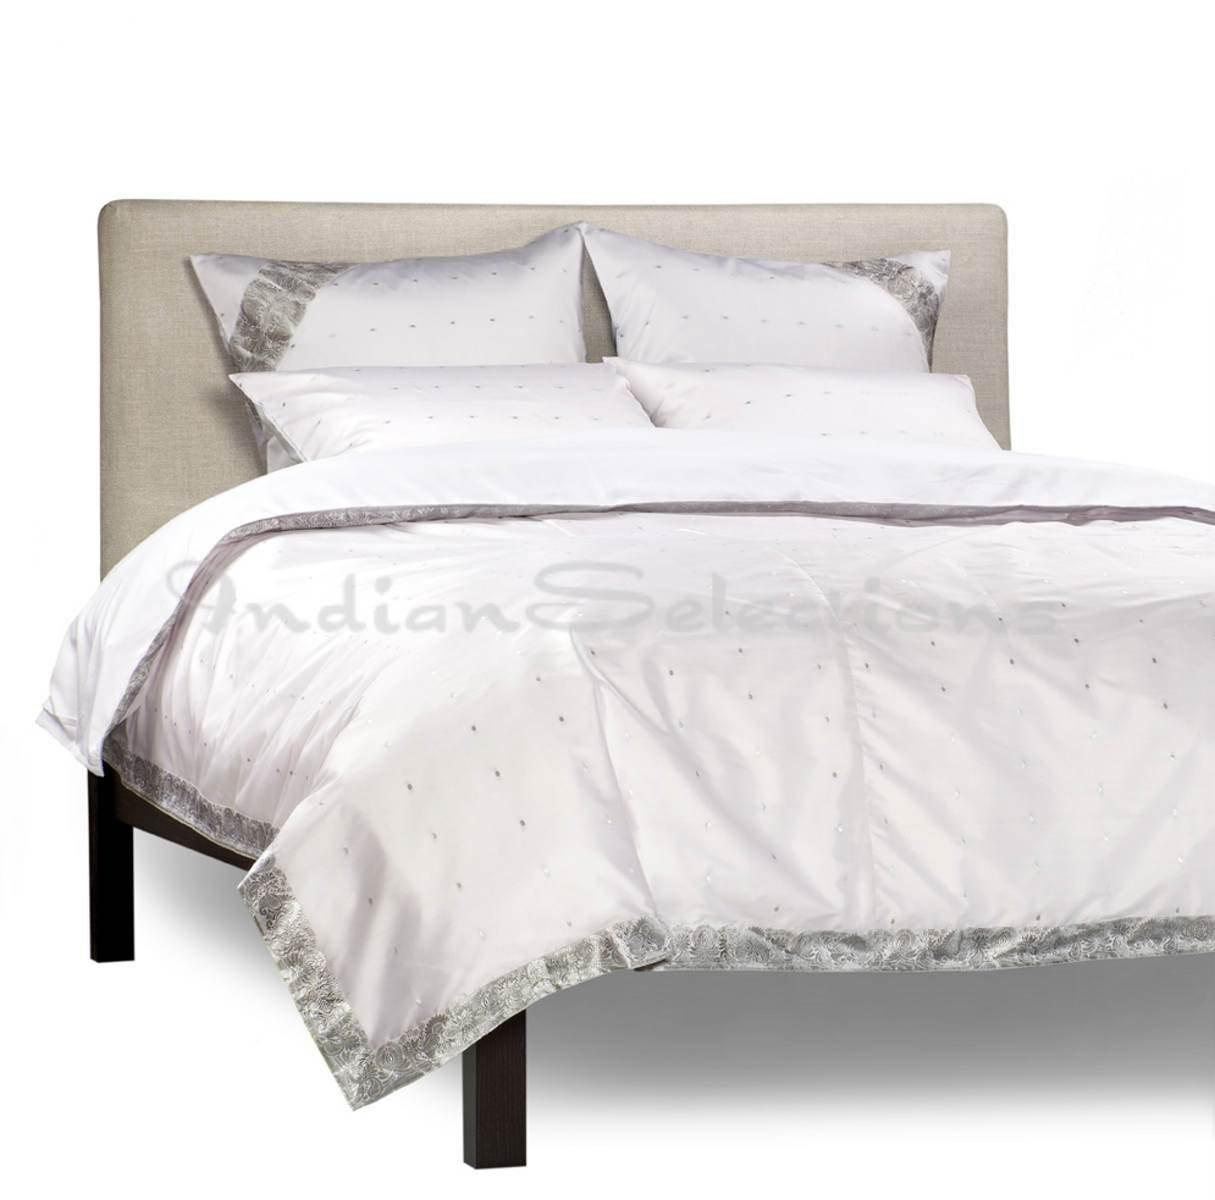 White Silver - 5 Piece Handmade Sari Duvet Cover Set with Pillow Covers / Euro Sham - Twin